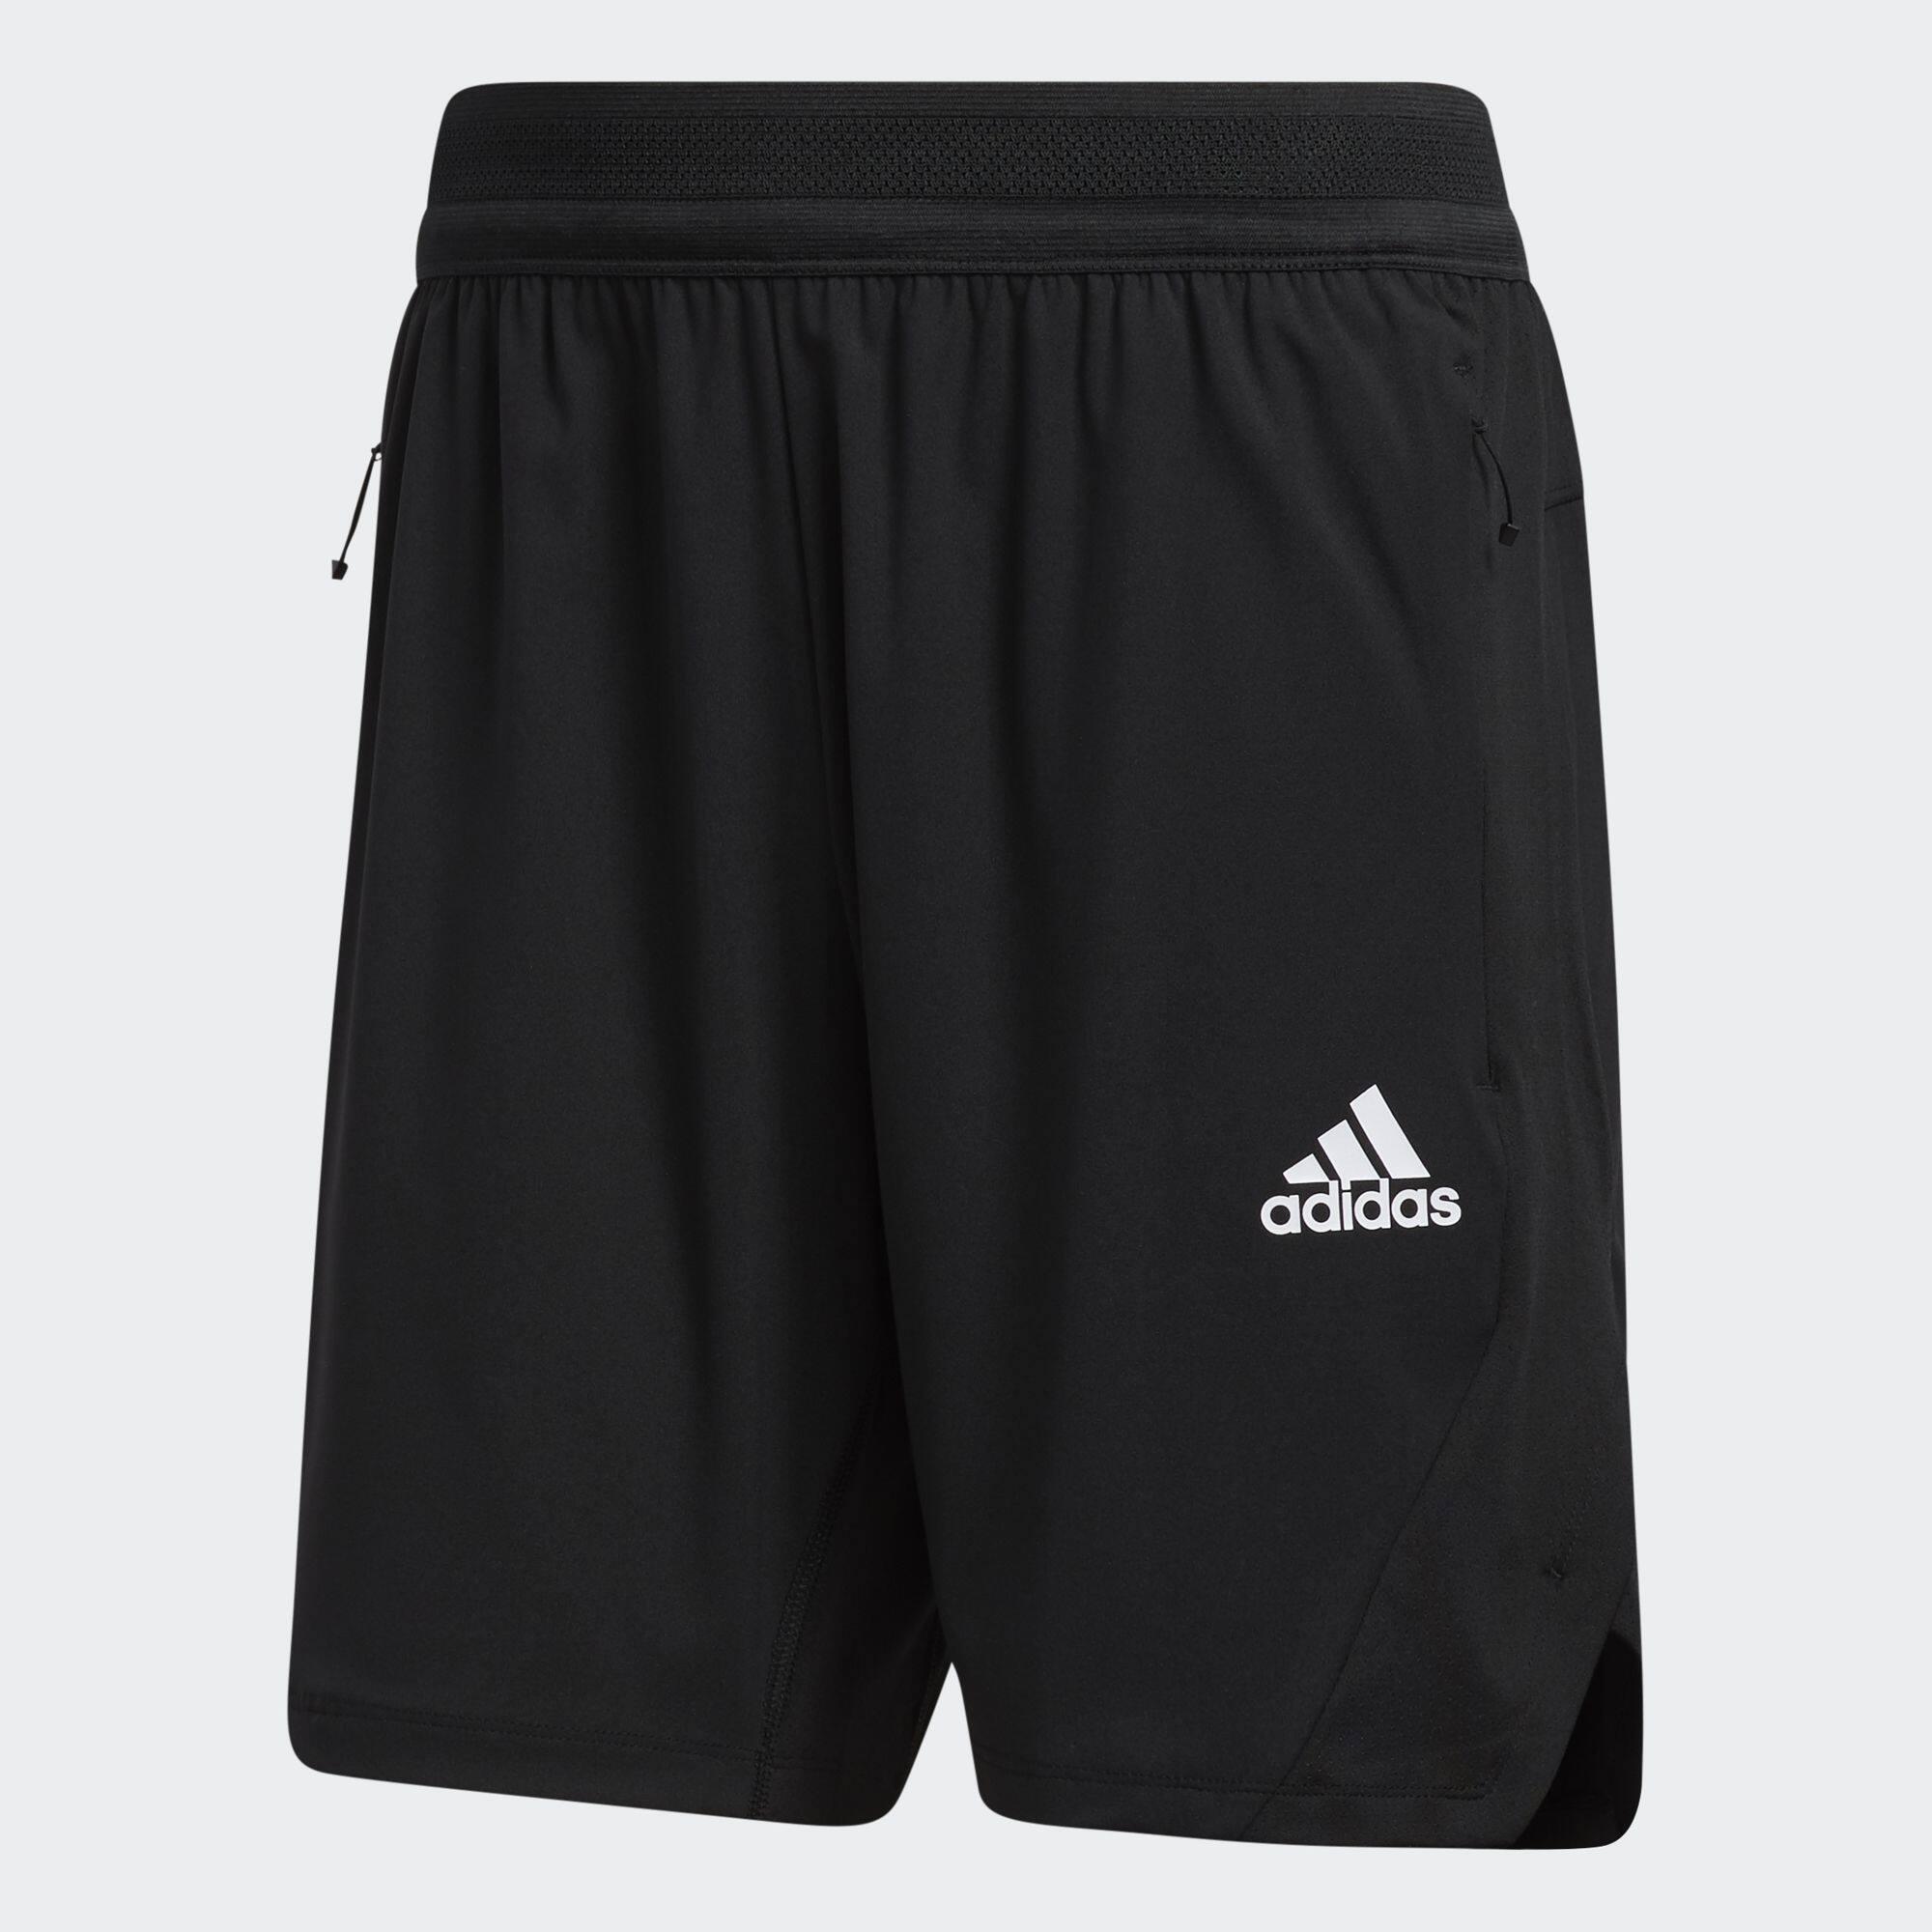 adidas TRAINING HEAT.RDY Training Shorts ผู้ชาย สีดำ GL7306